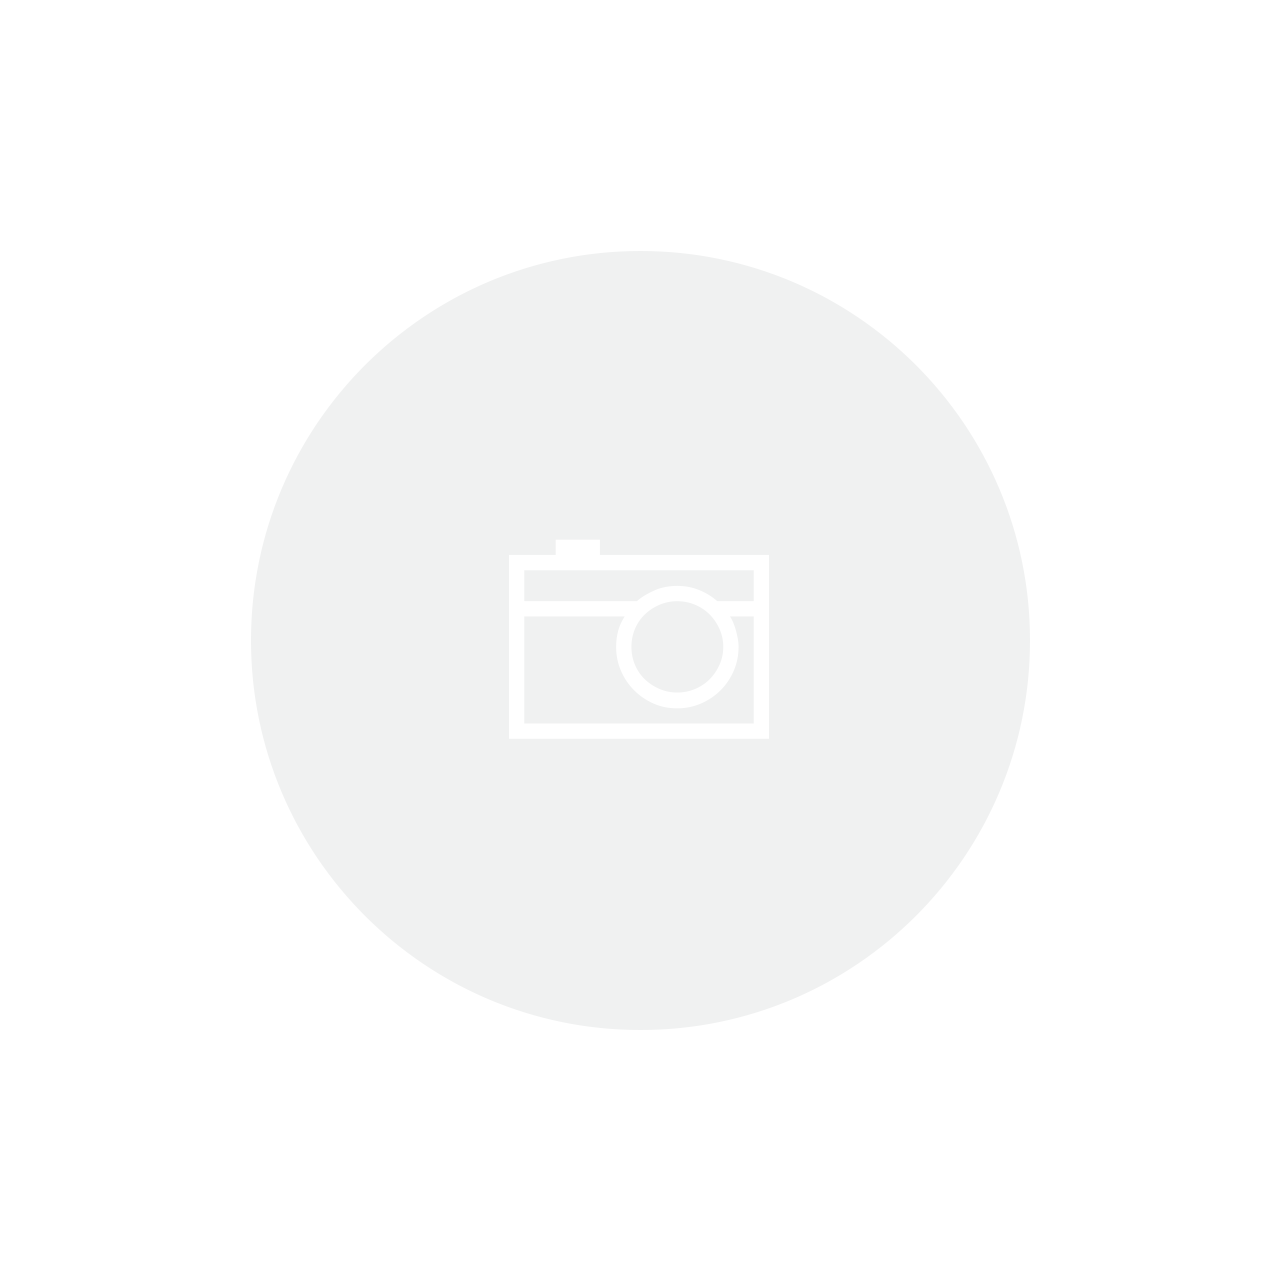 Gaspedal Speed-Buster c/ App - Porsche